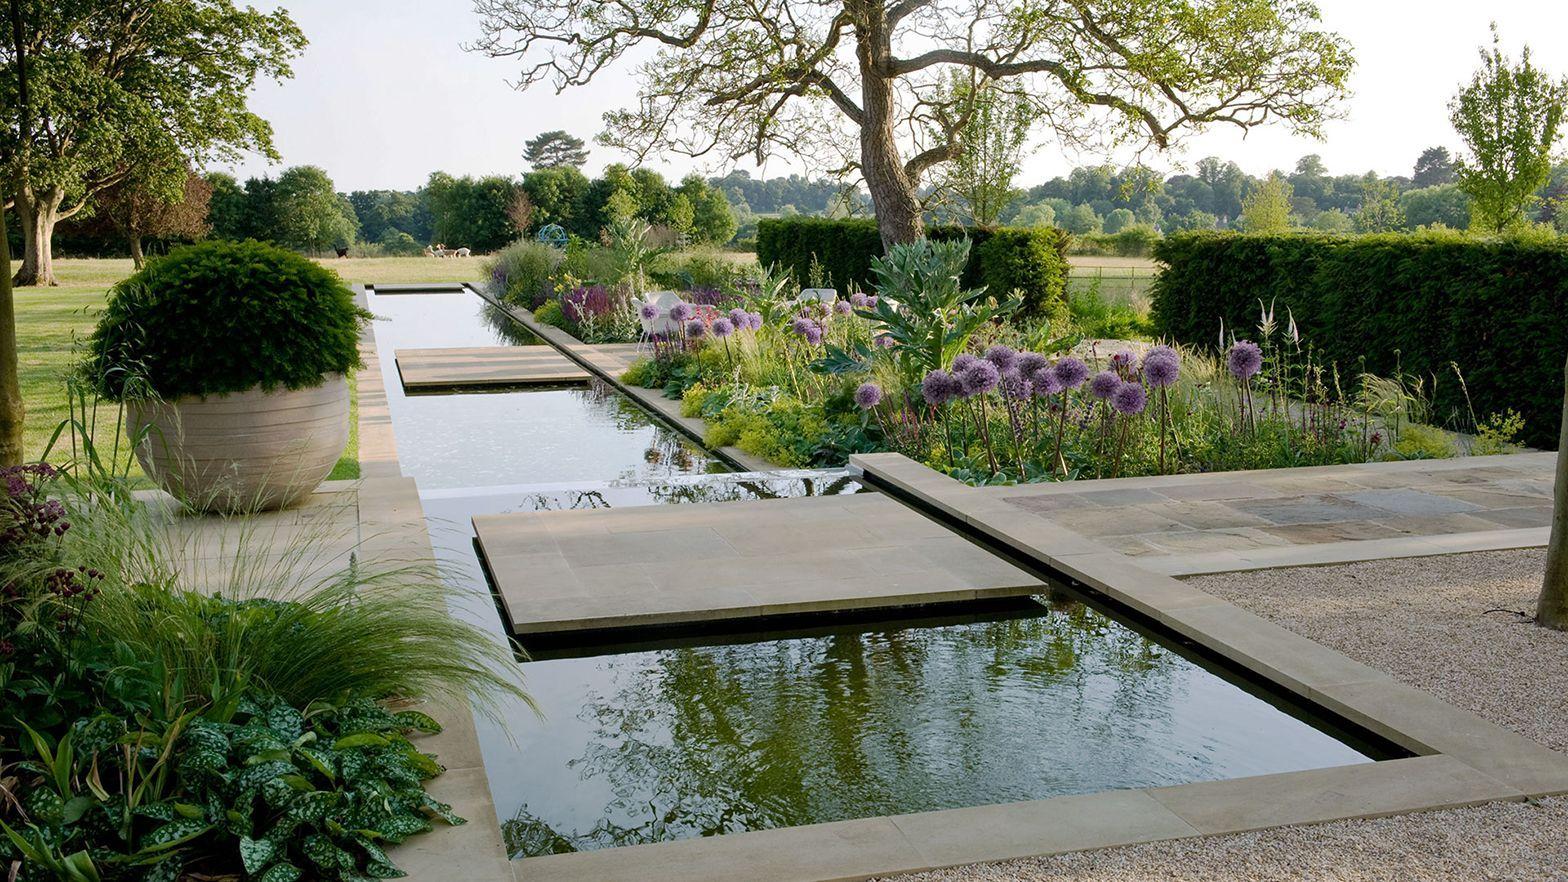 East Gloucestershire Garden In 2020 Water Features In The Garden Garden Design Modern Garden